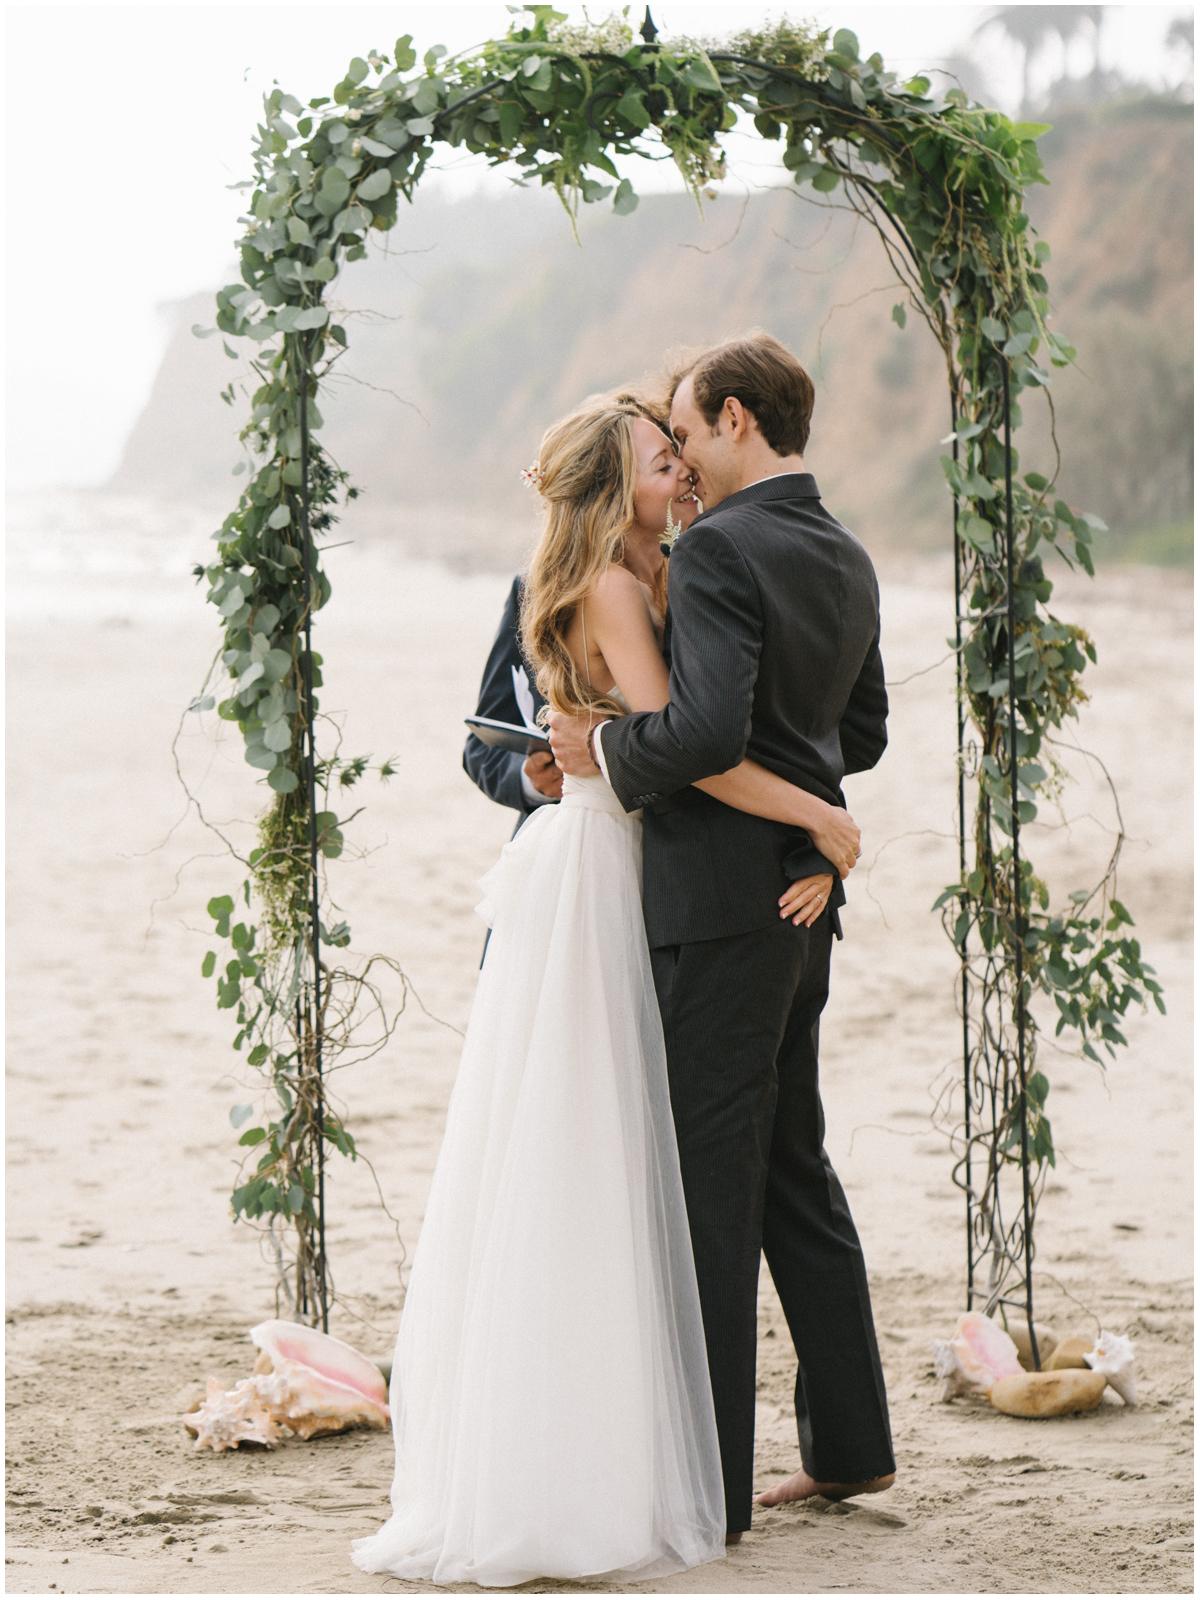 Santa Babara Elopement Wedding Photographer - Pinnel Photography-01-09.jpg